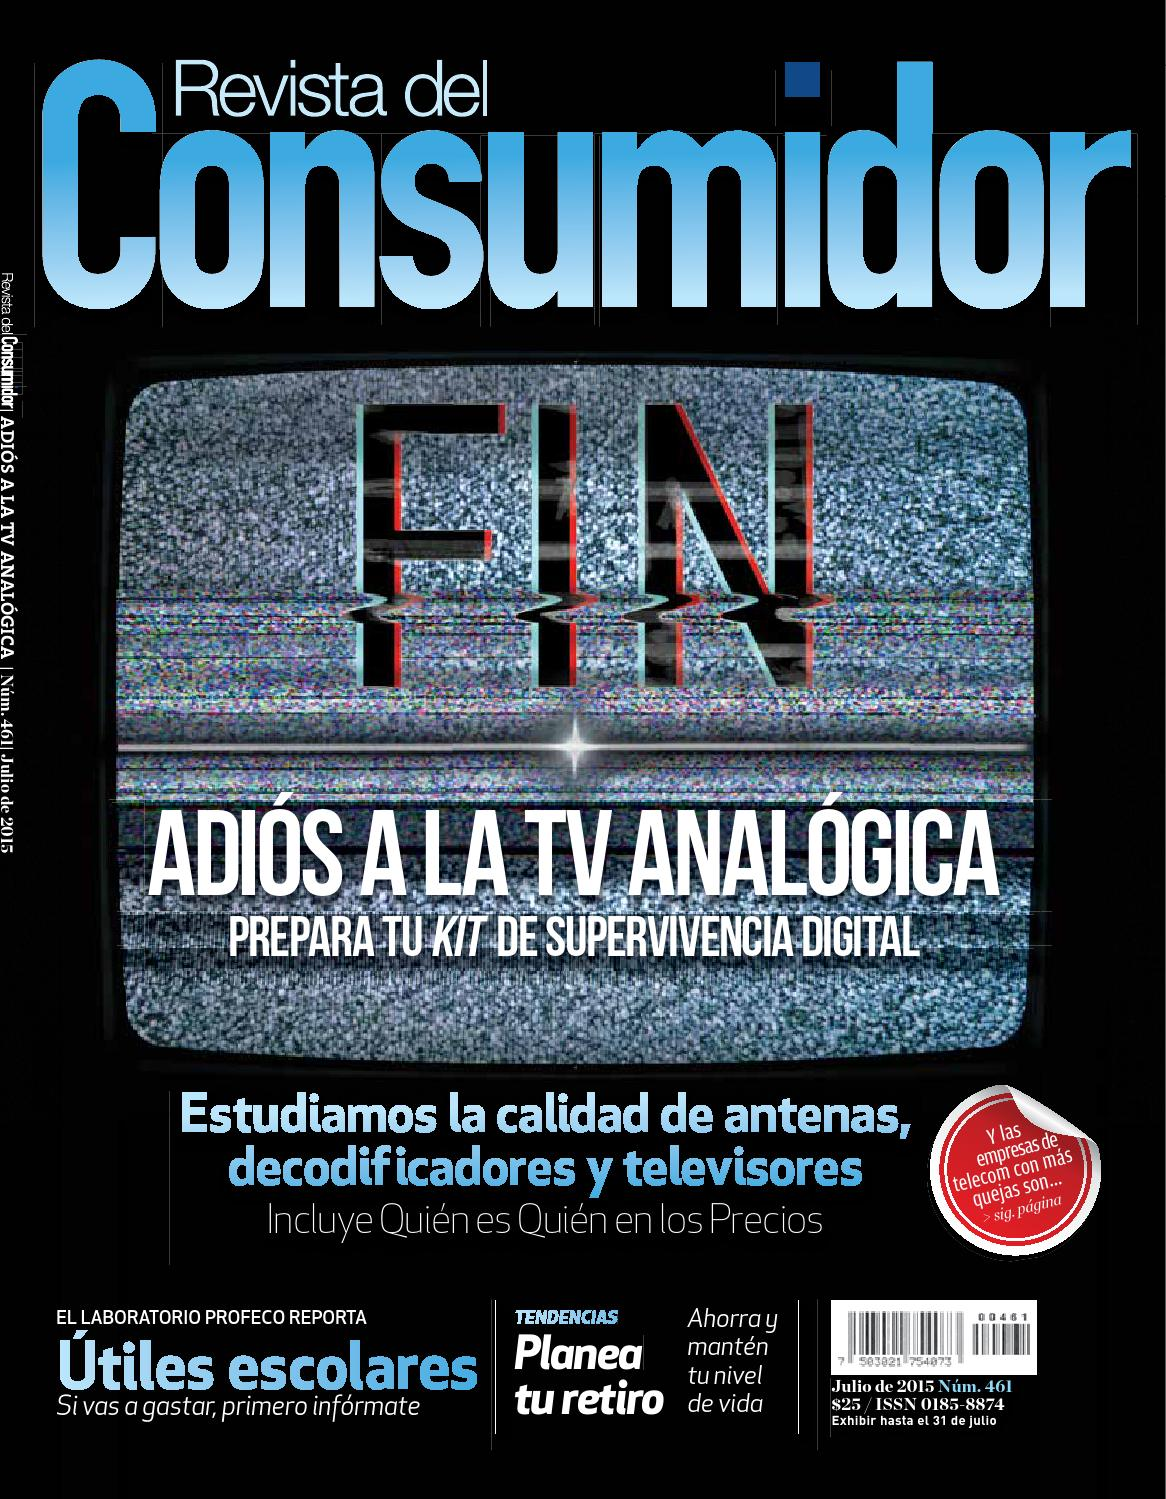 3cabcfef1c Revista del Consumidor 2015 Julio 2015 Ed 461 by PROFECO - issuu